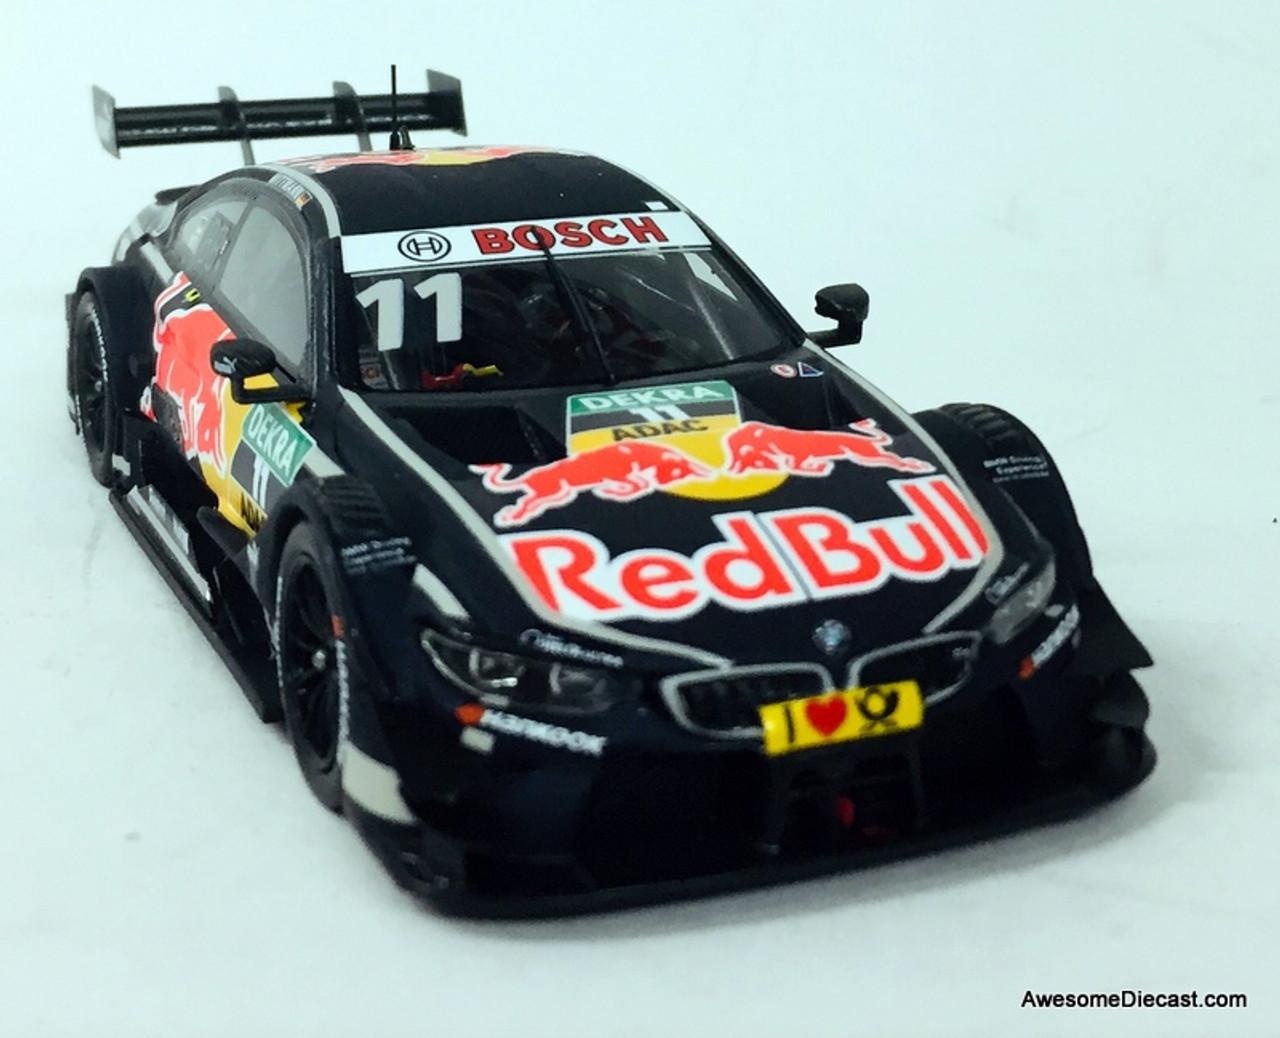 Only One!! Spark 1:43 2017 BMW M4 Team RMG Red Bull: Hockenheim 2017, Germany